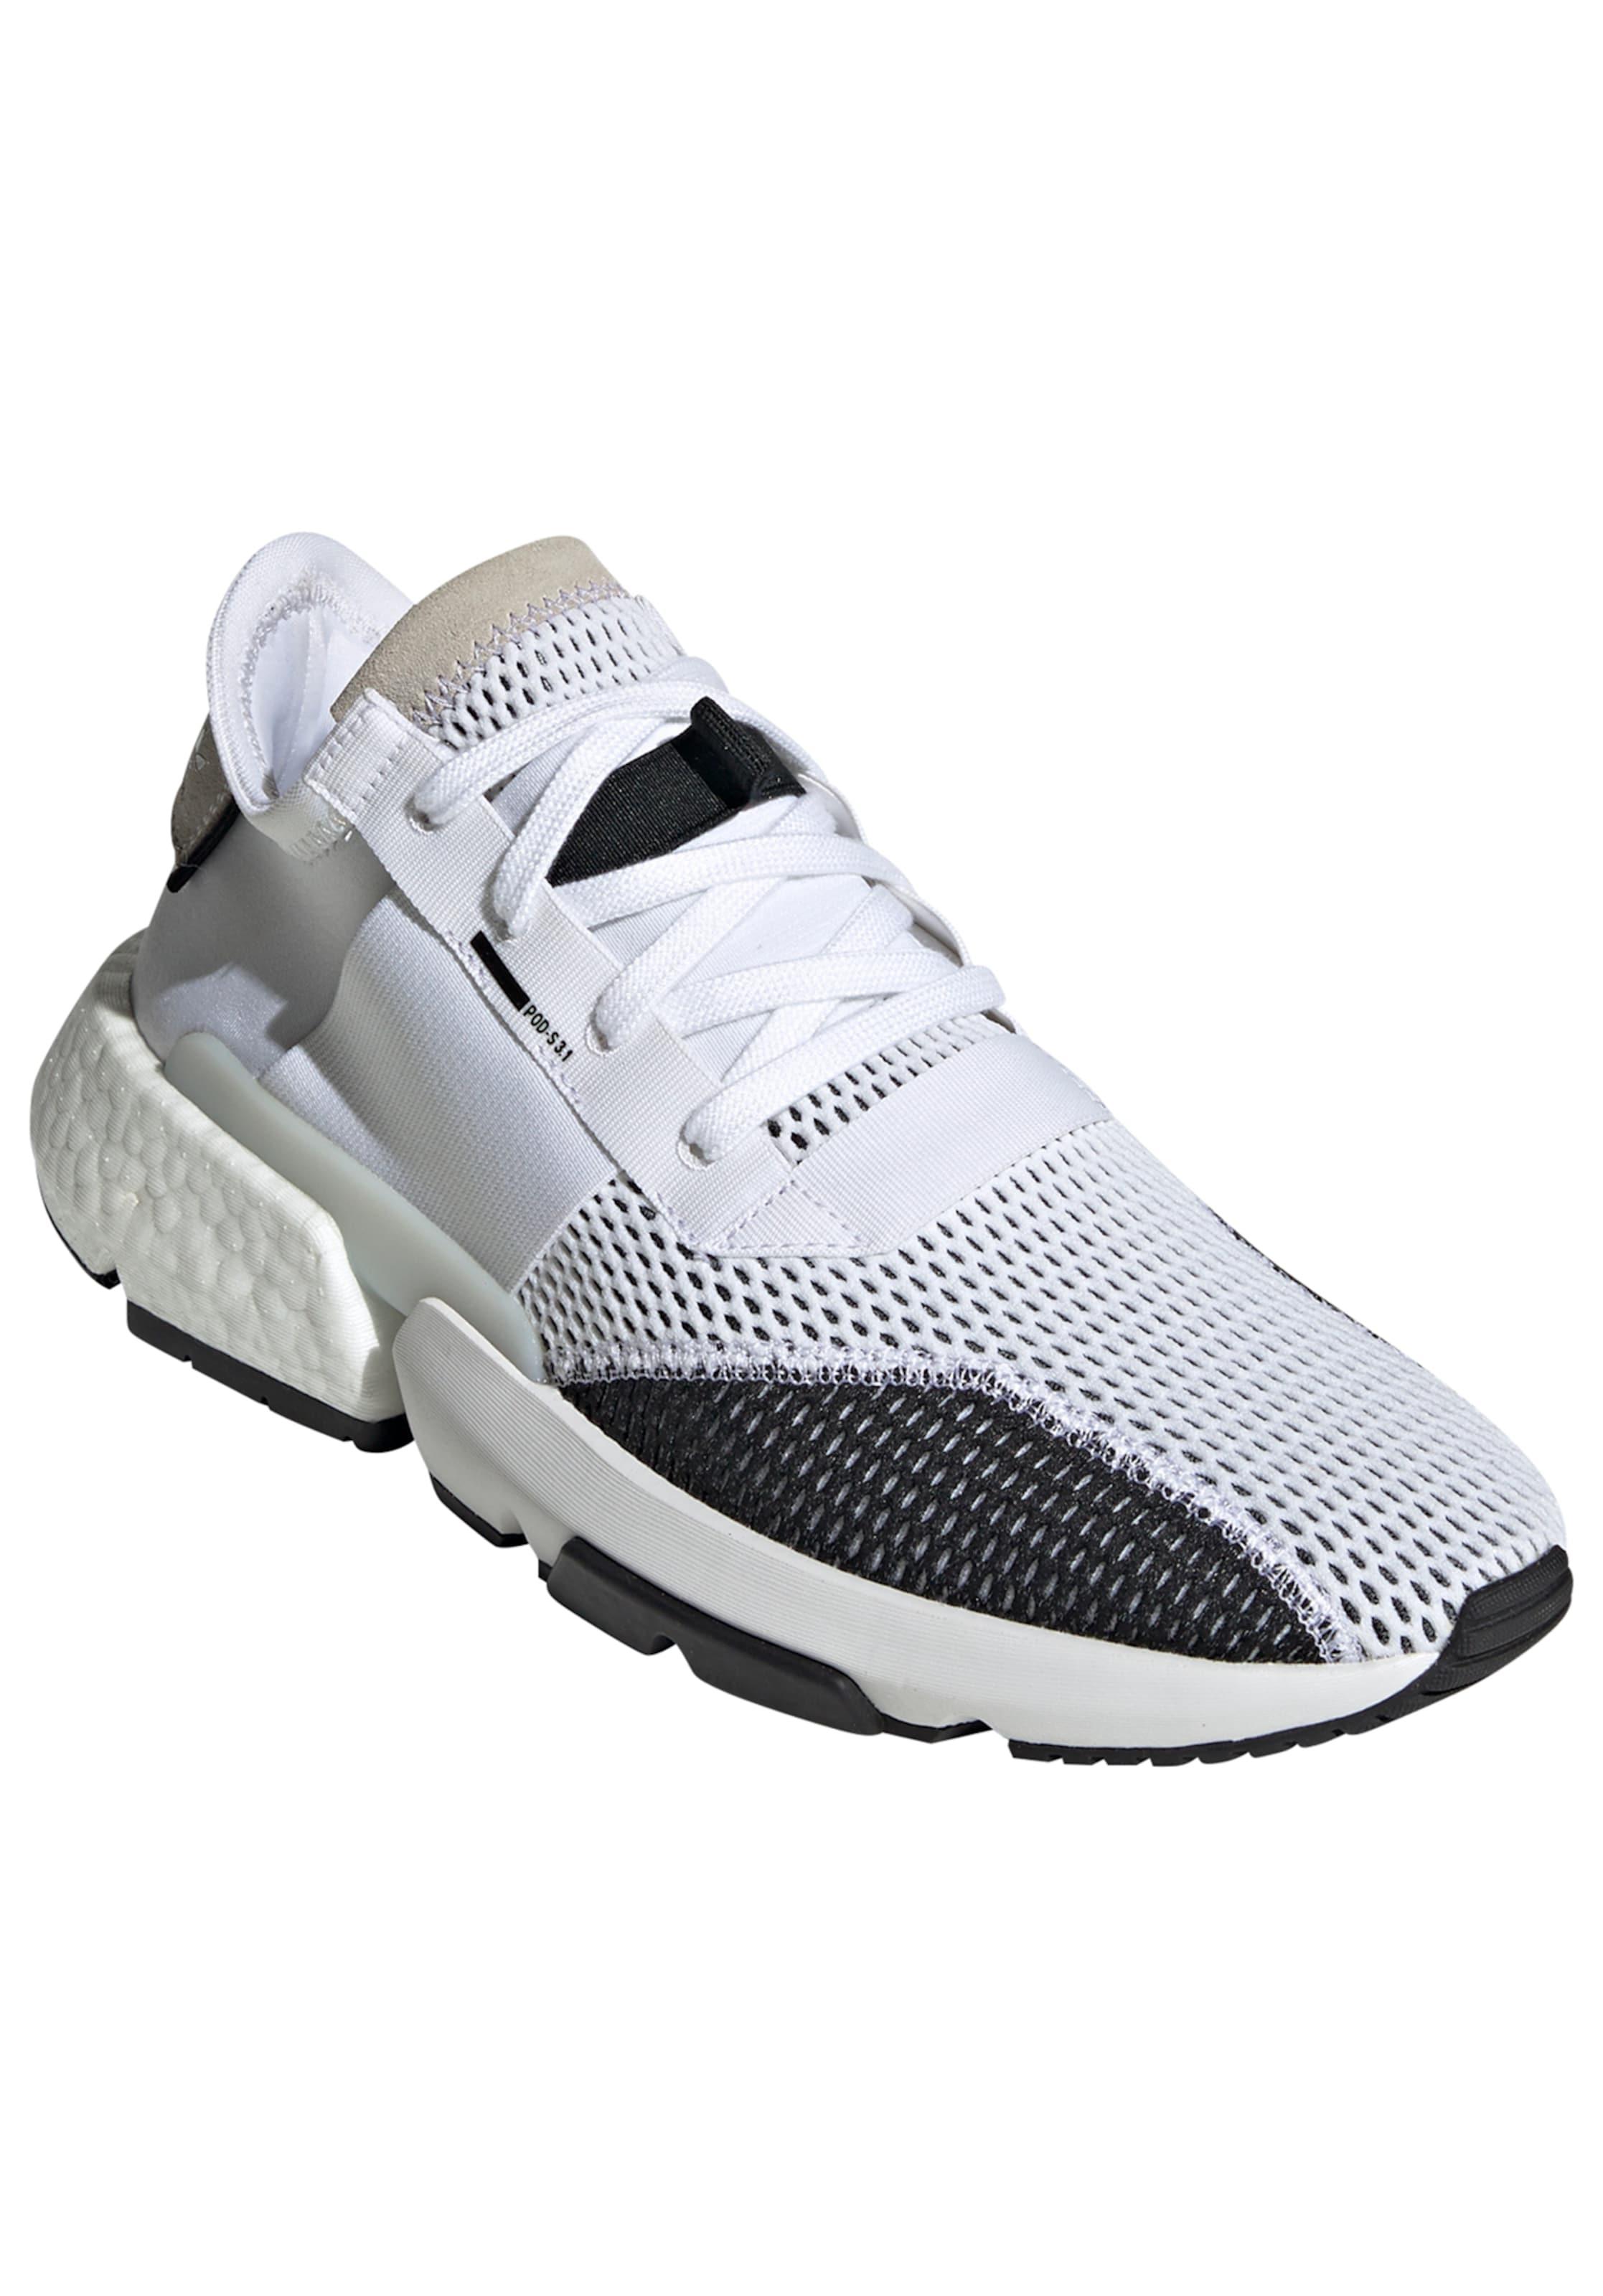 BeigeSchwarz Sneaker Adidas s3 Weiß Originals 'pod 1' In H9E2DWIY